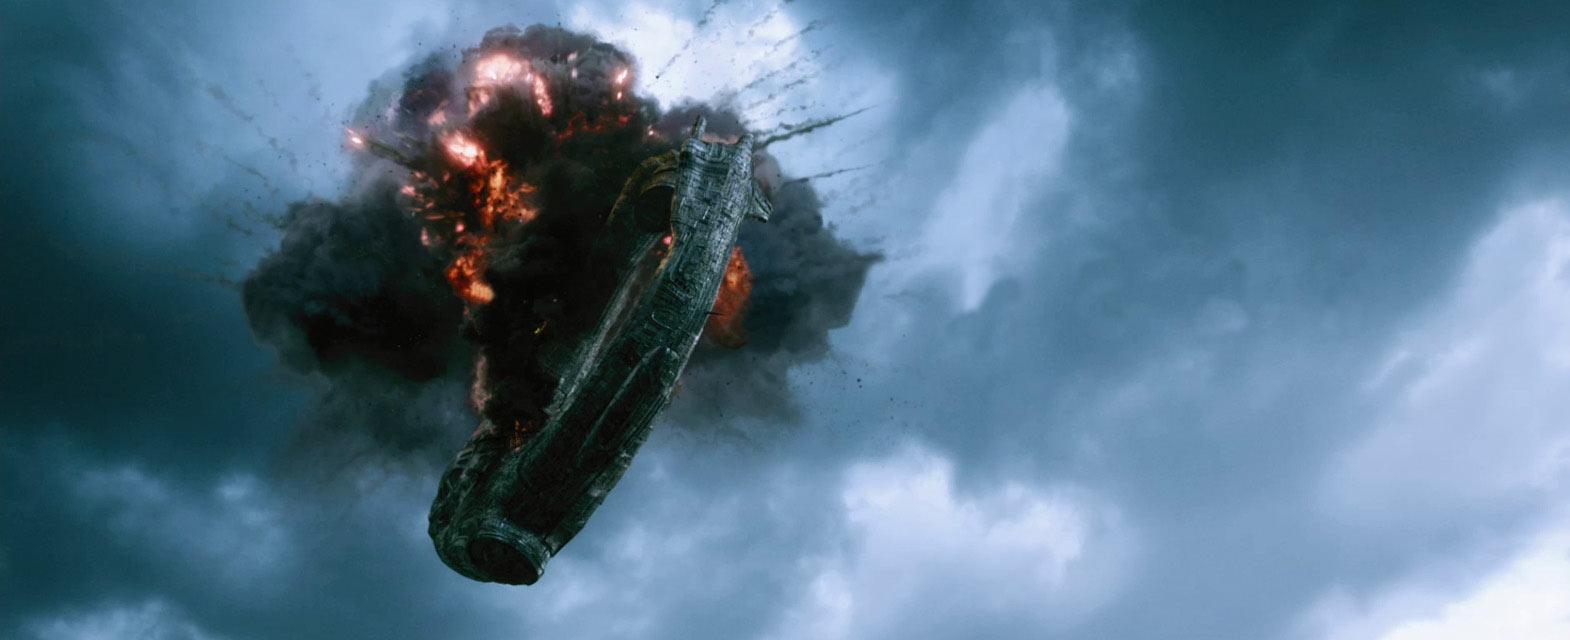 space ship crash - photo #41